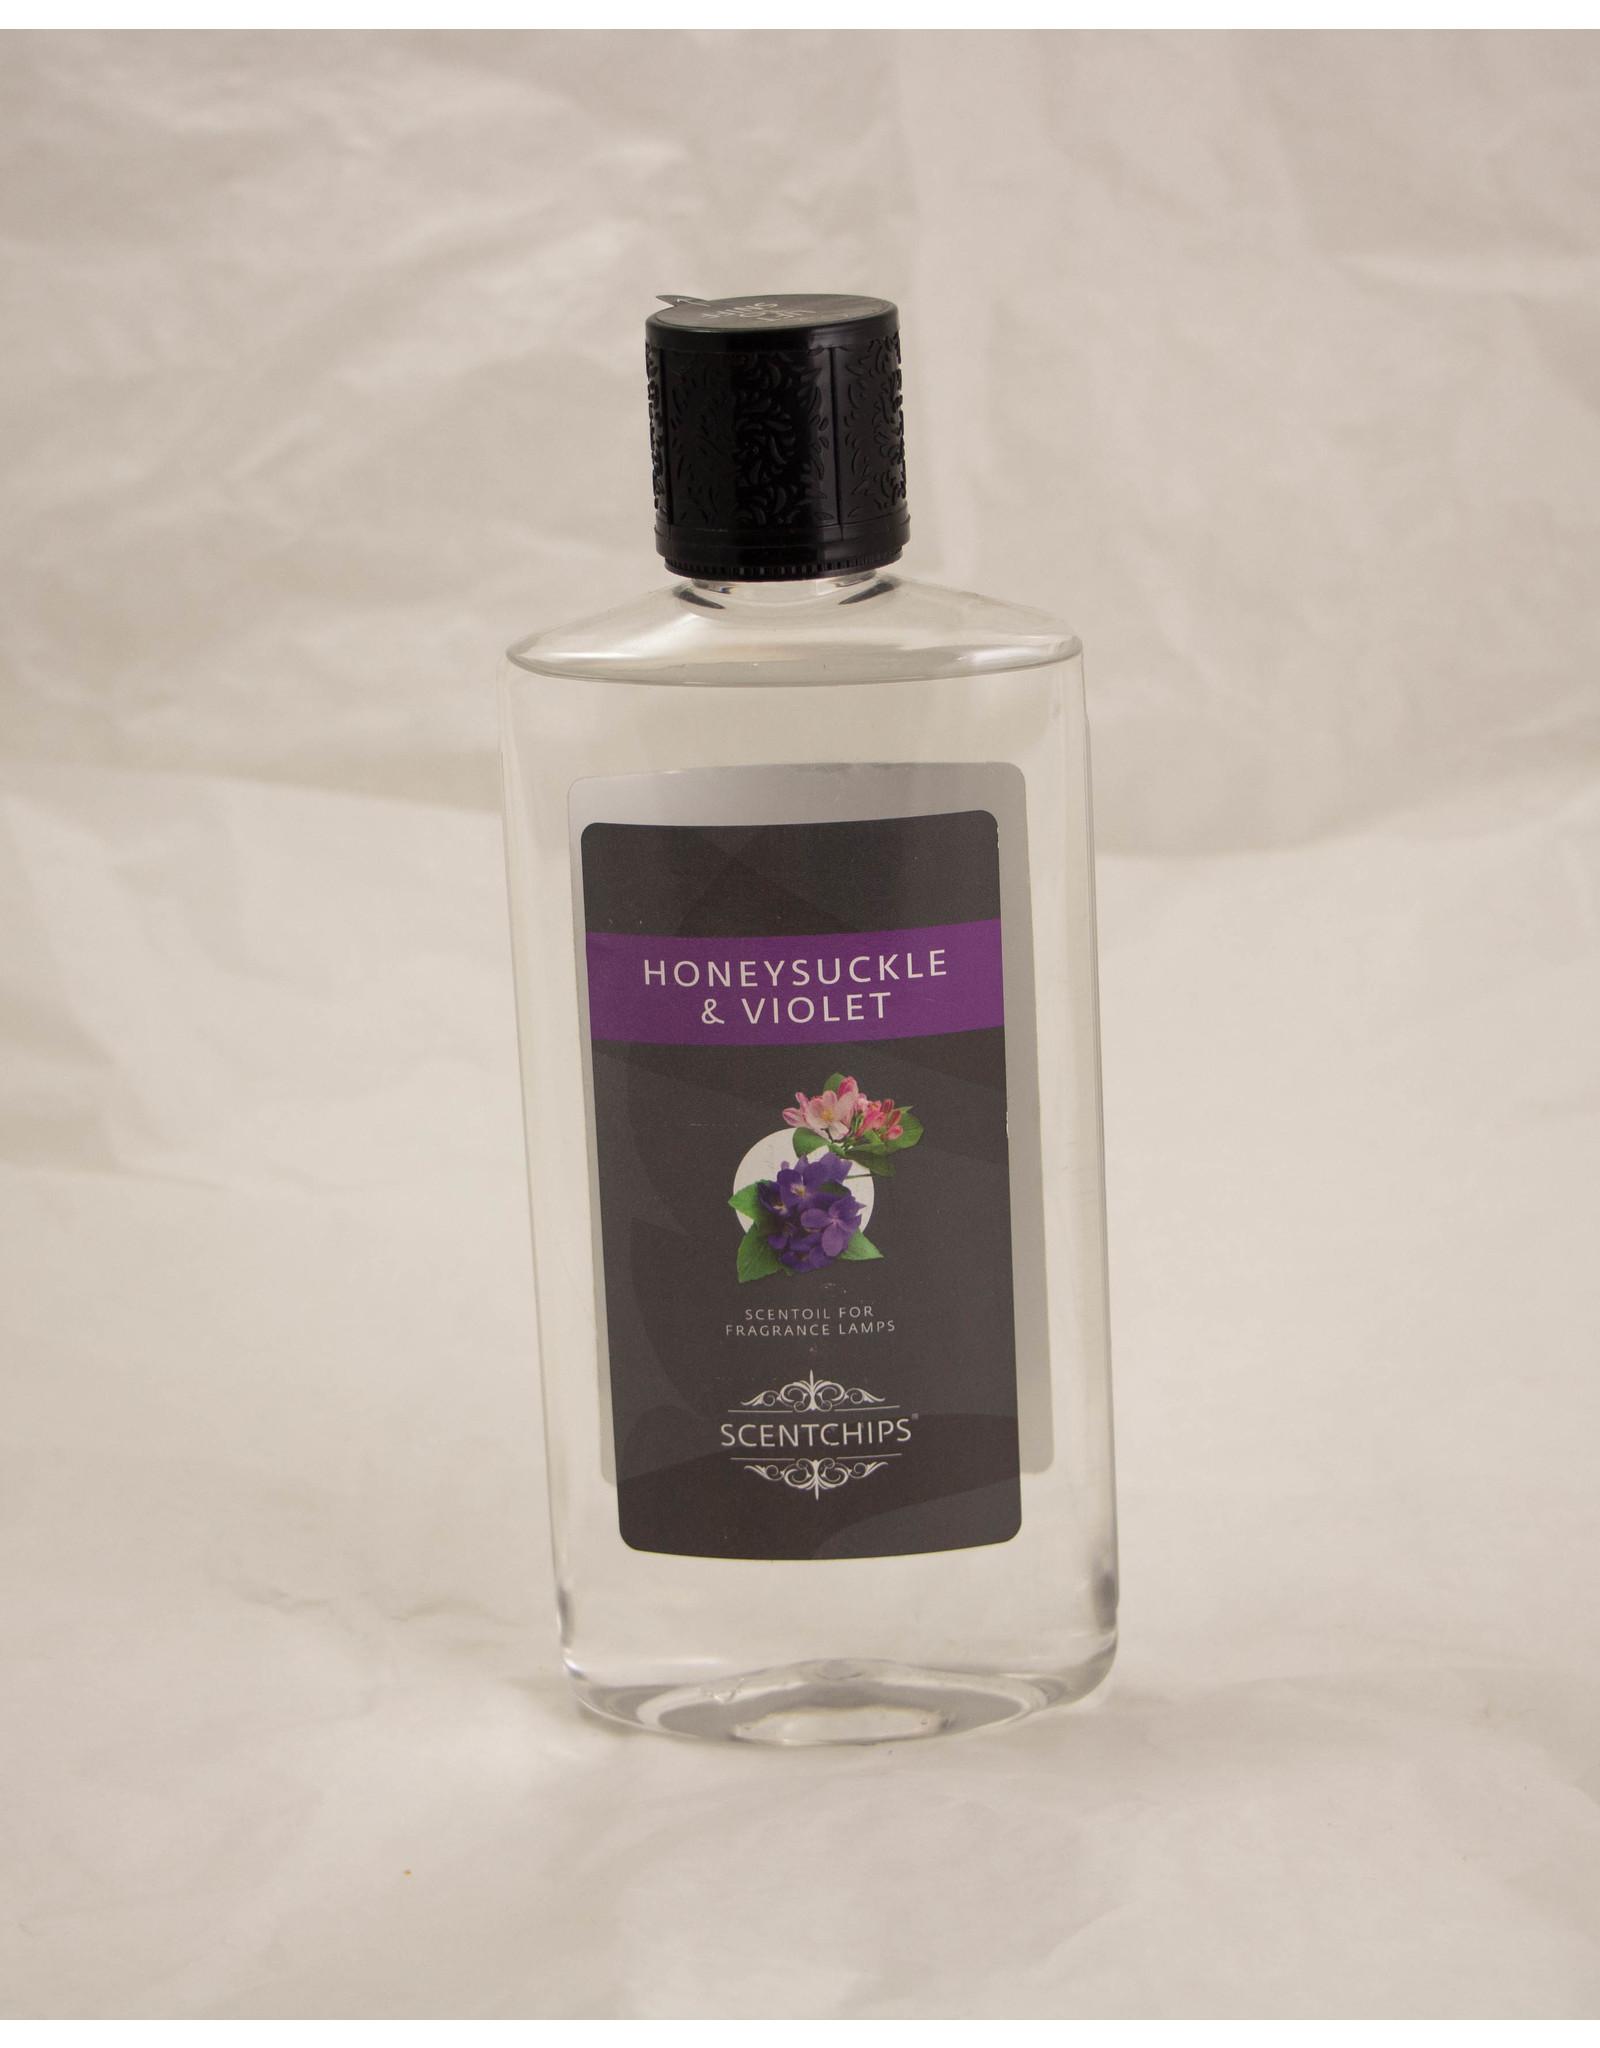 ScentChips Honeysuckle & Violet 475ml